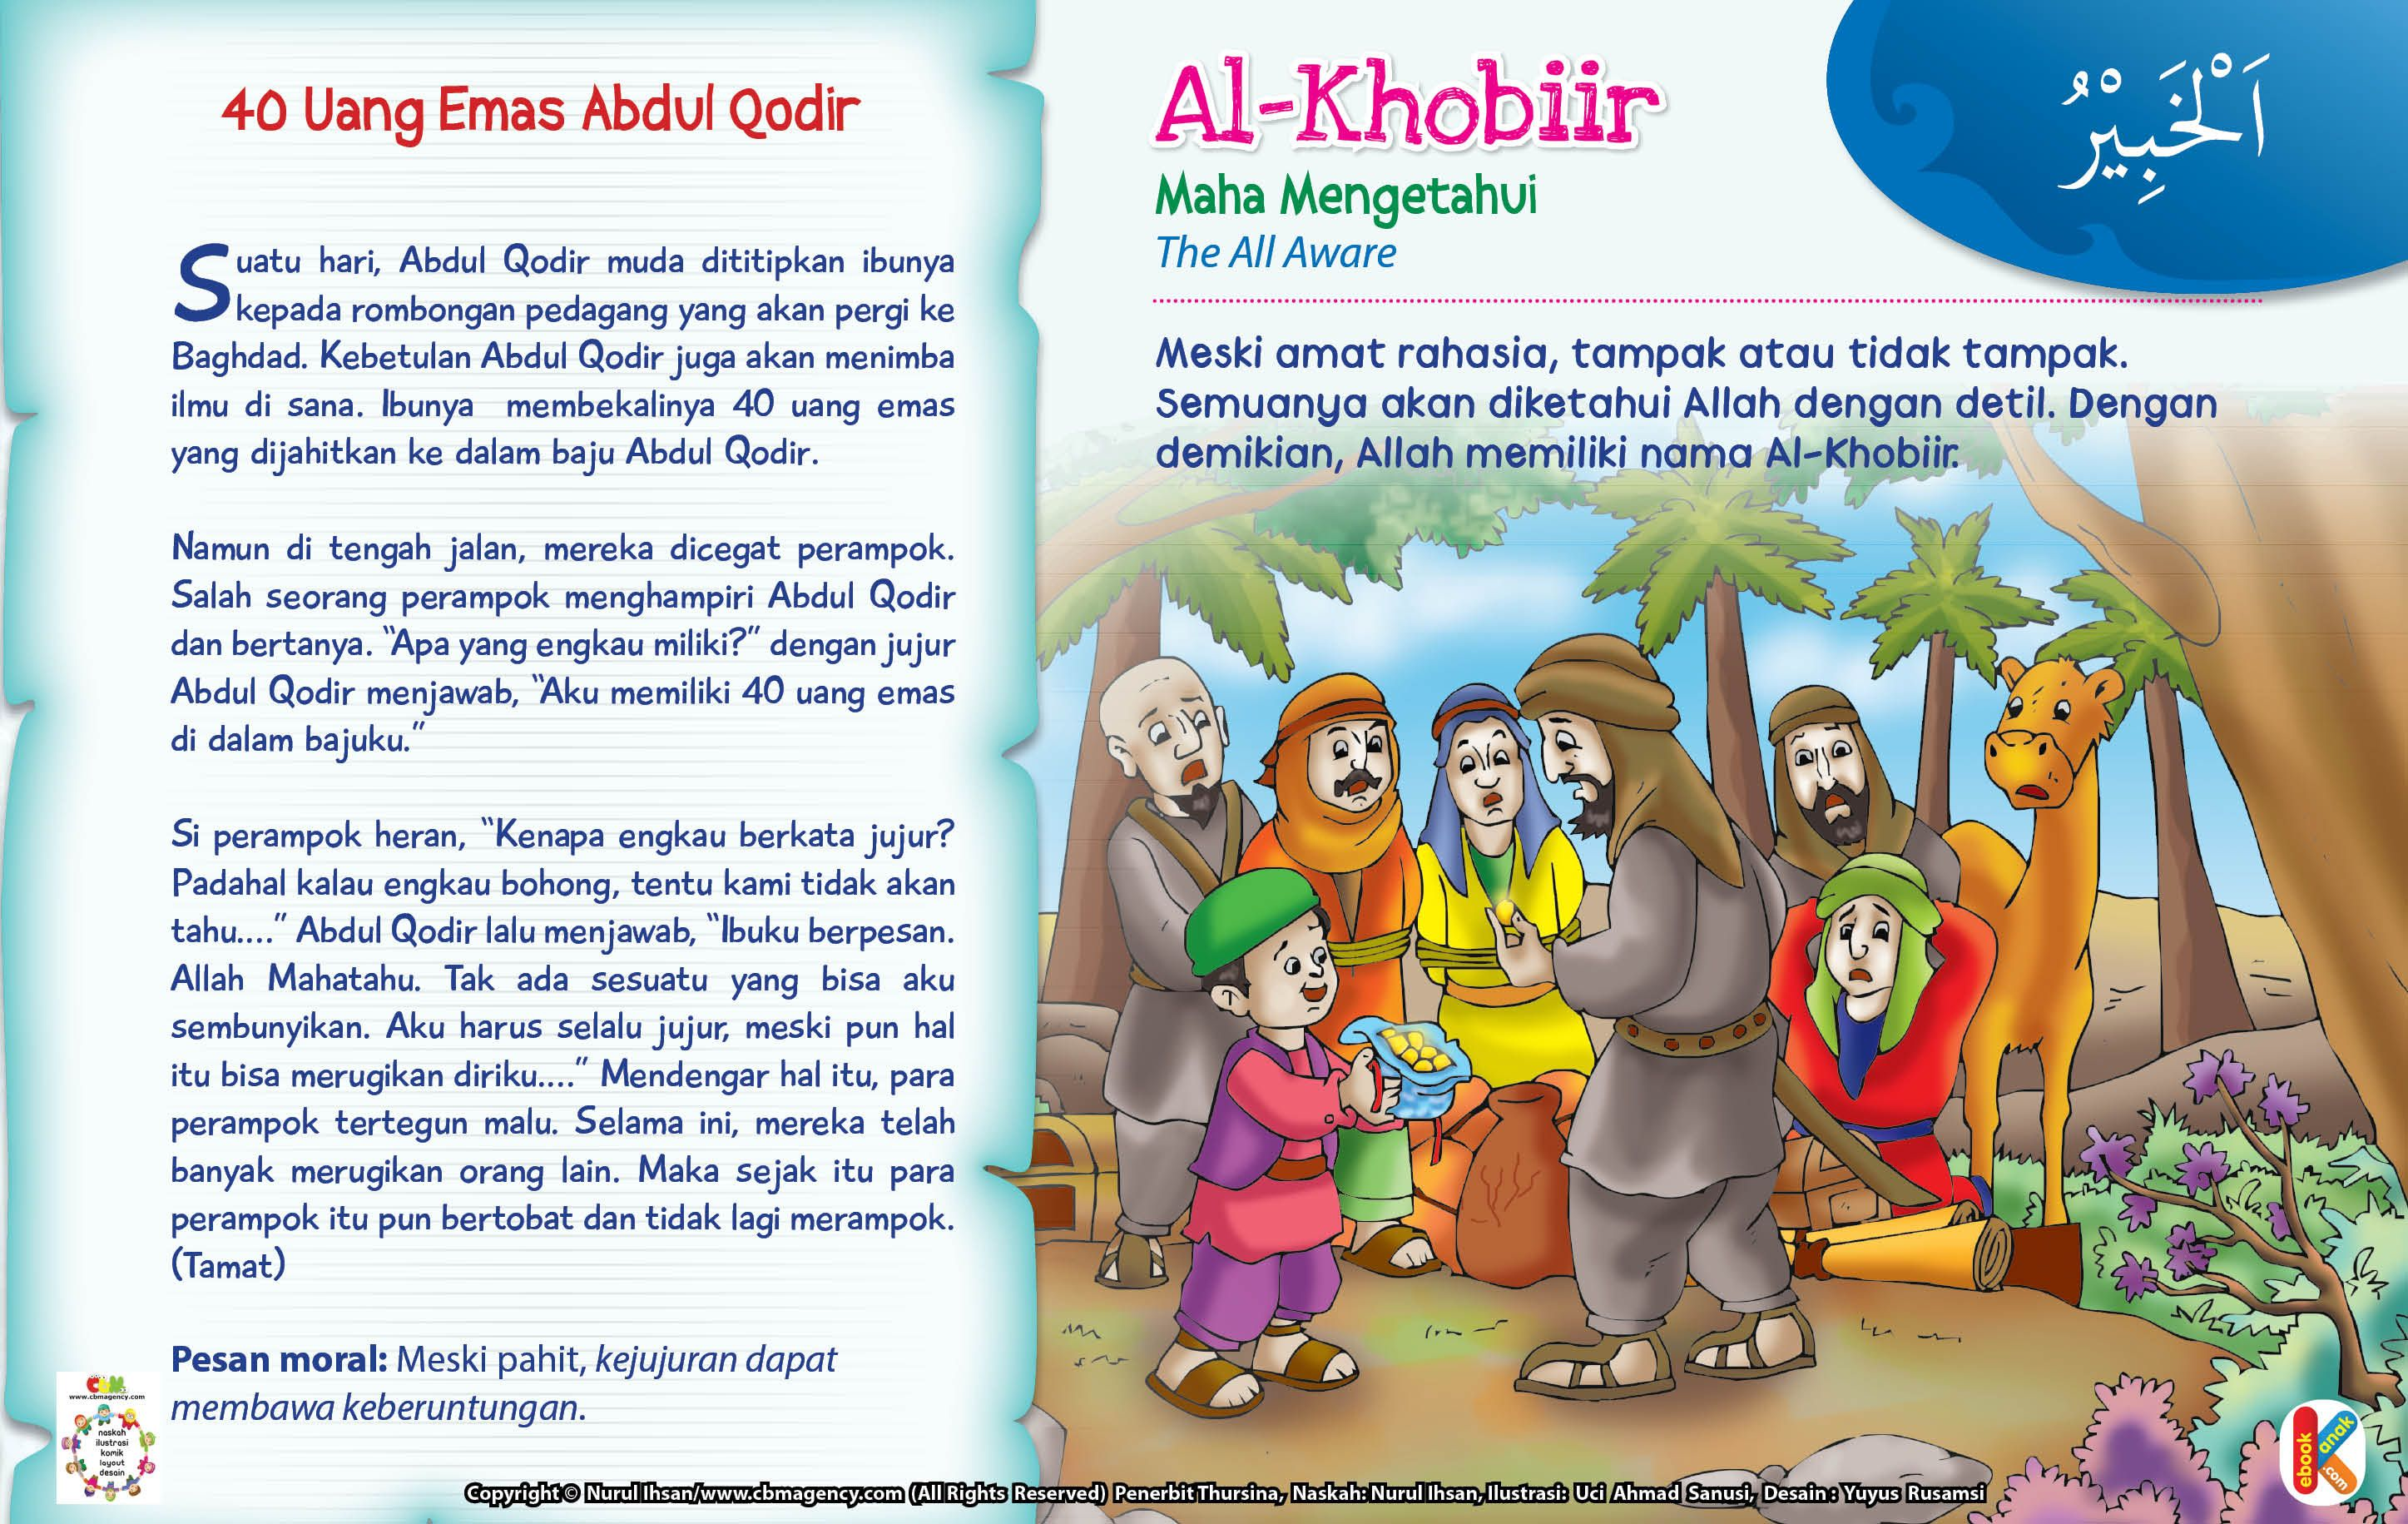 Kisah Asma'ul Husna AlKhobiir (Dengan gambar) Anak